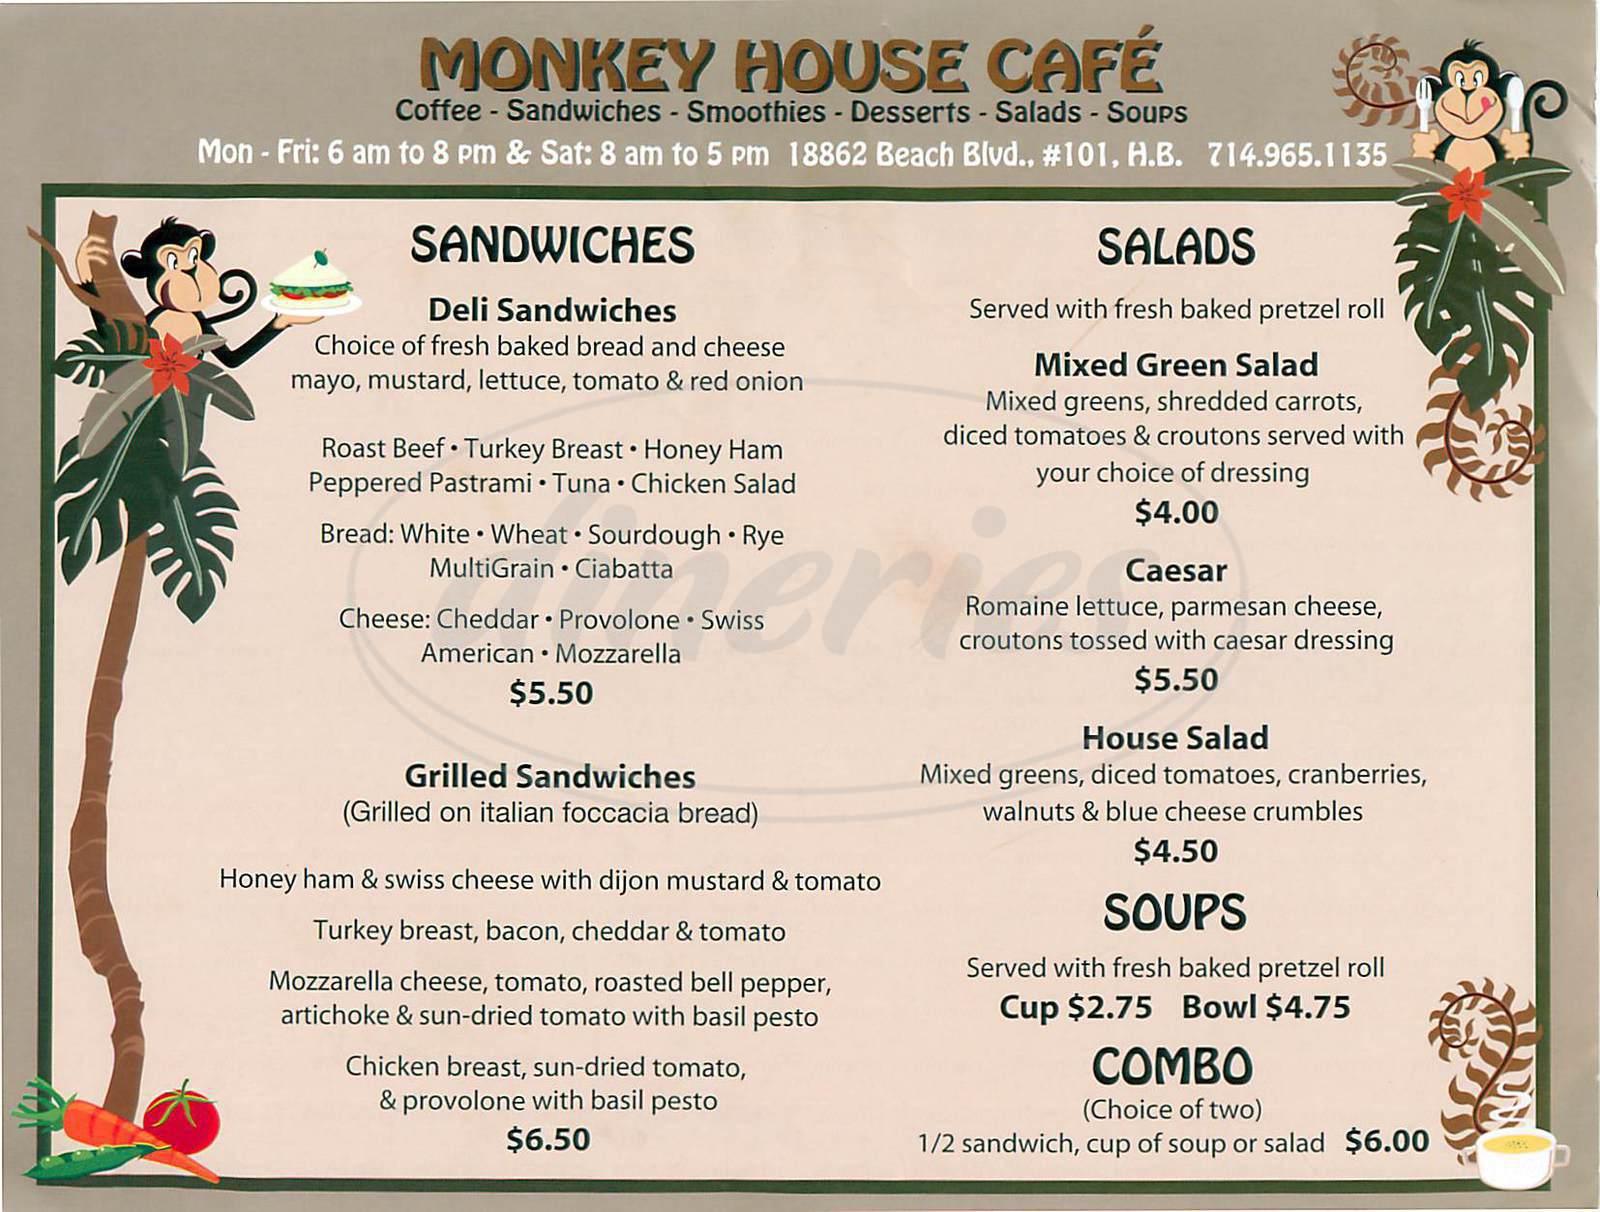 menu for Monkey House Café